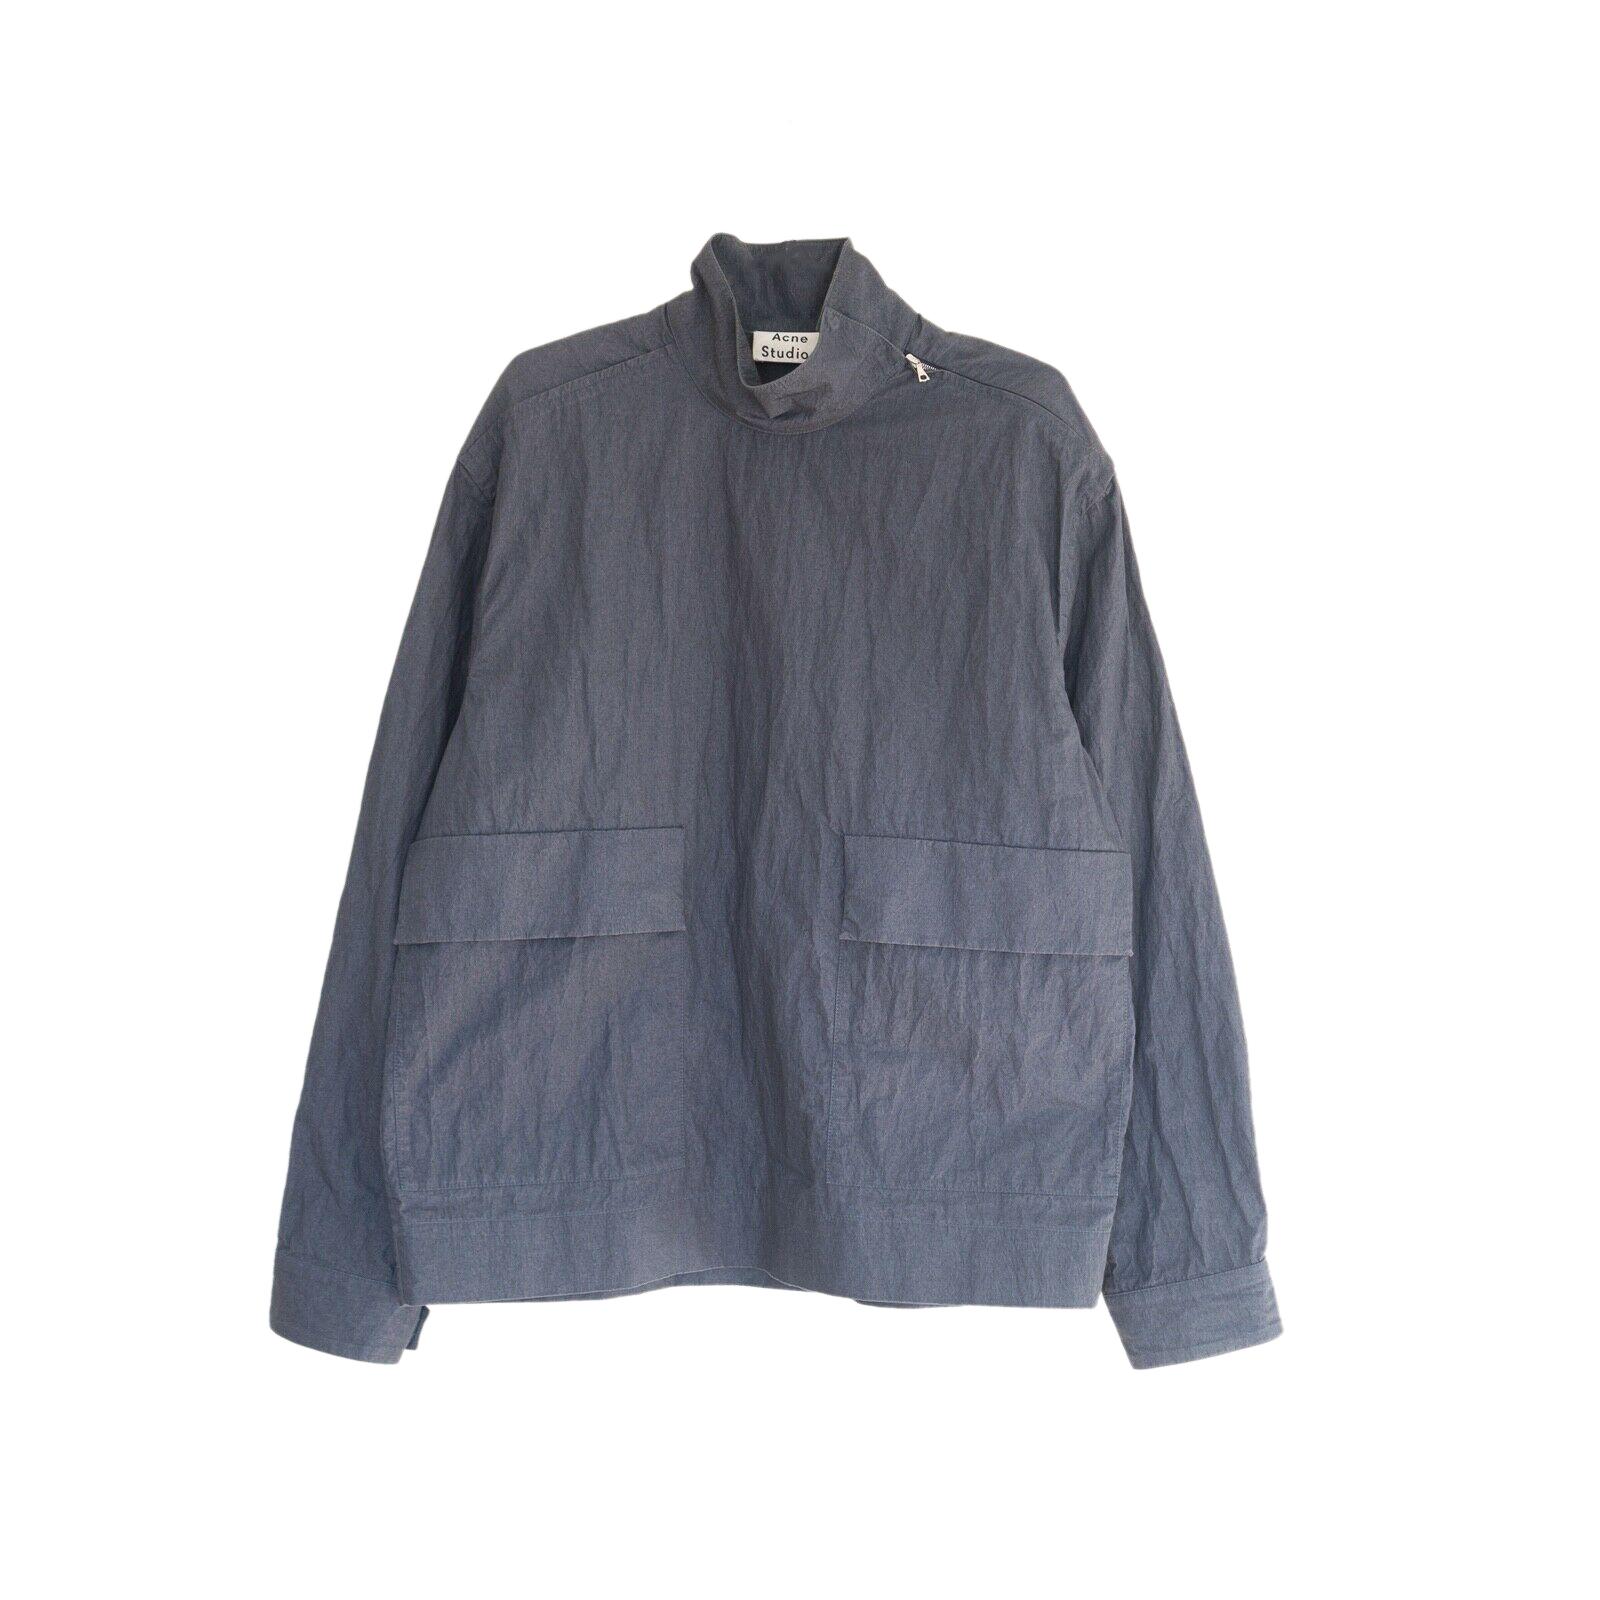 Acne Studios Blouse Shirt